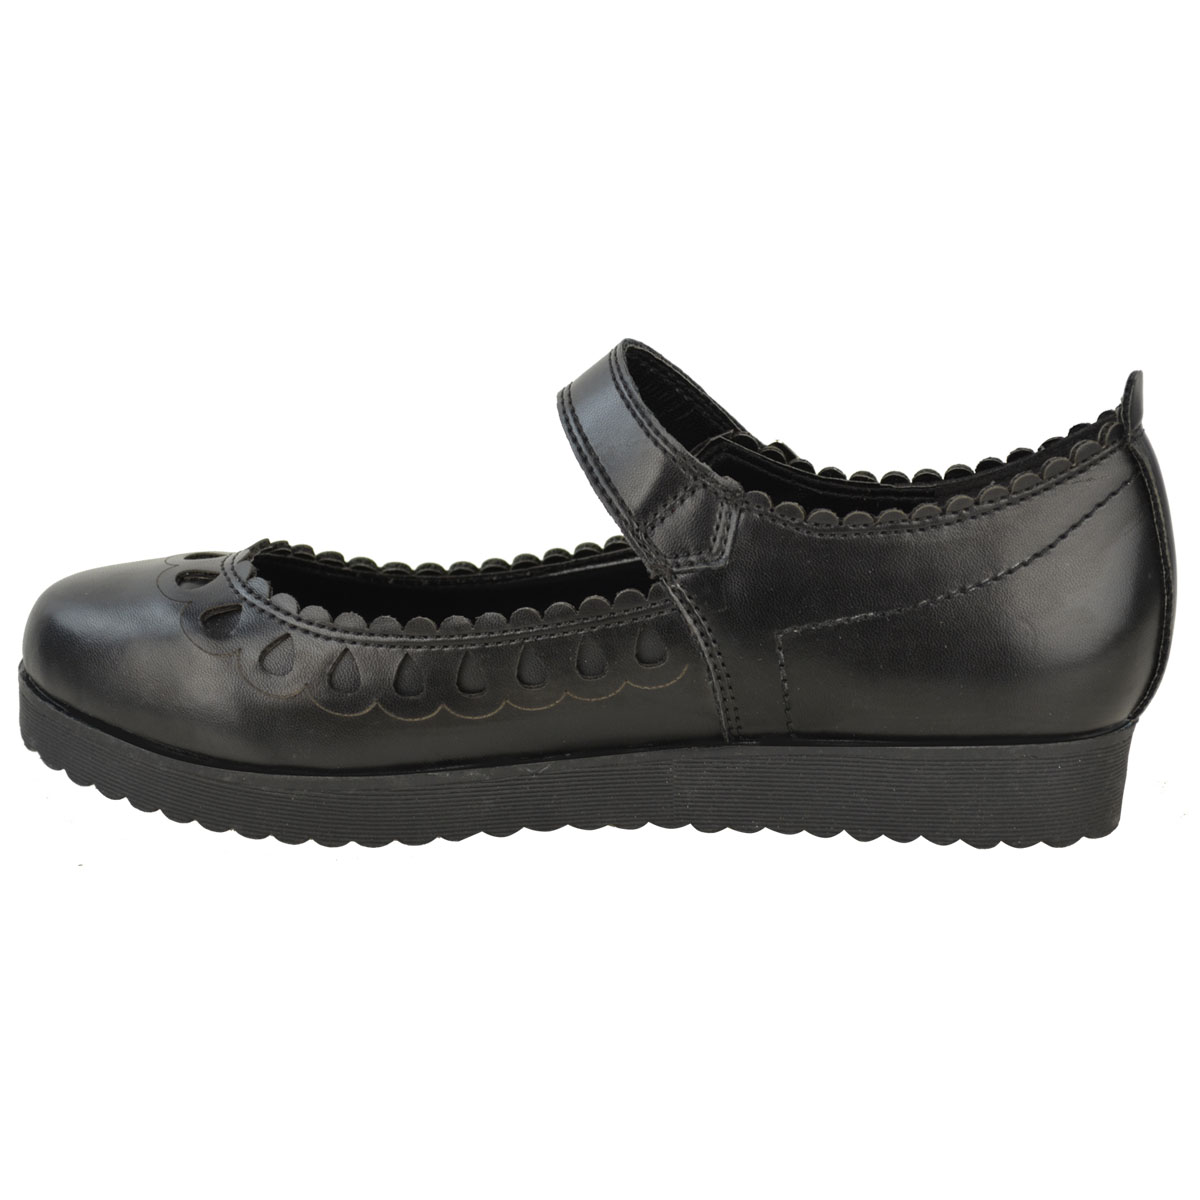 New-Womens-Ladies-Girls-Flats-Shoes-Pumps-School-Work-Office-Geek-Low-Heels-Size thumbnail 8